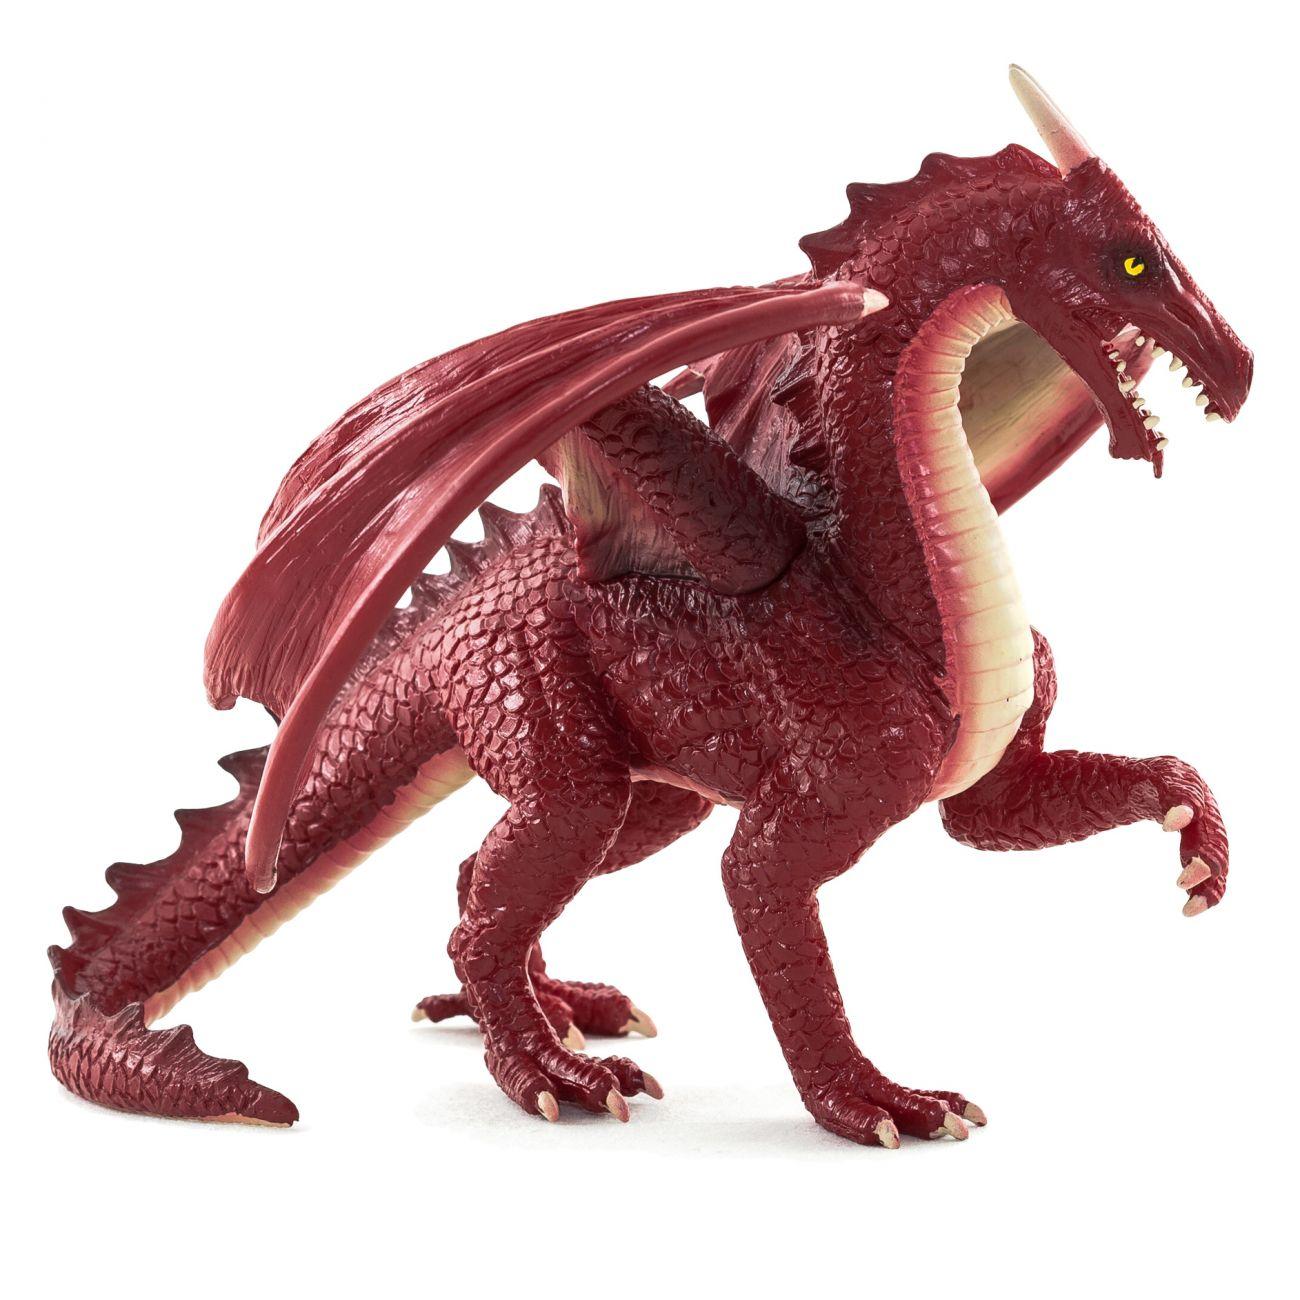 Dinozaver Red Dragon deluxe